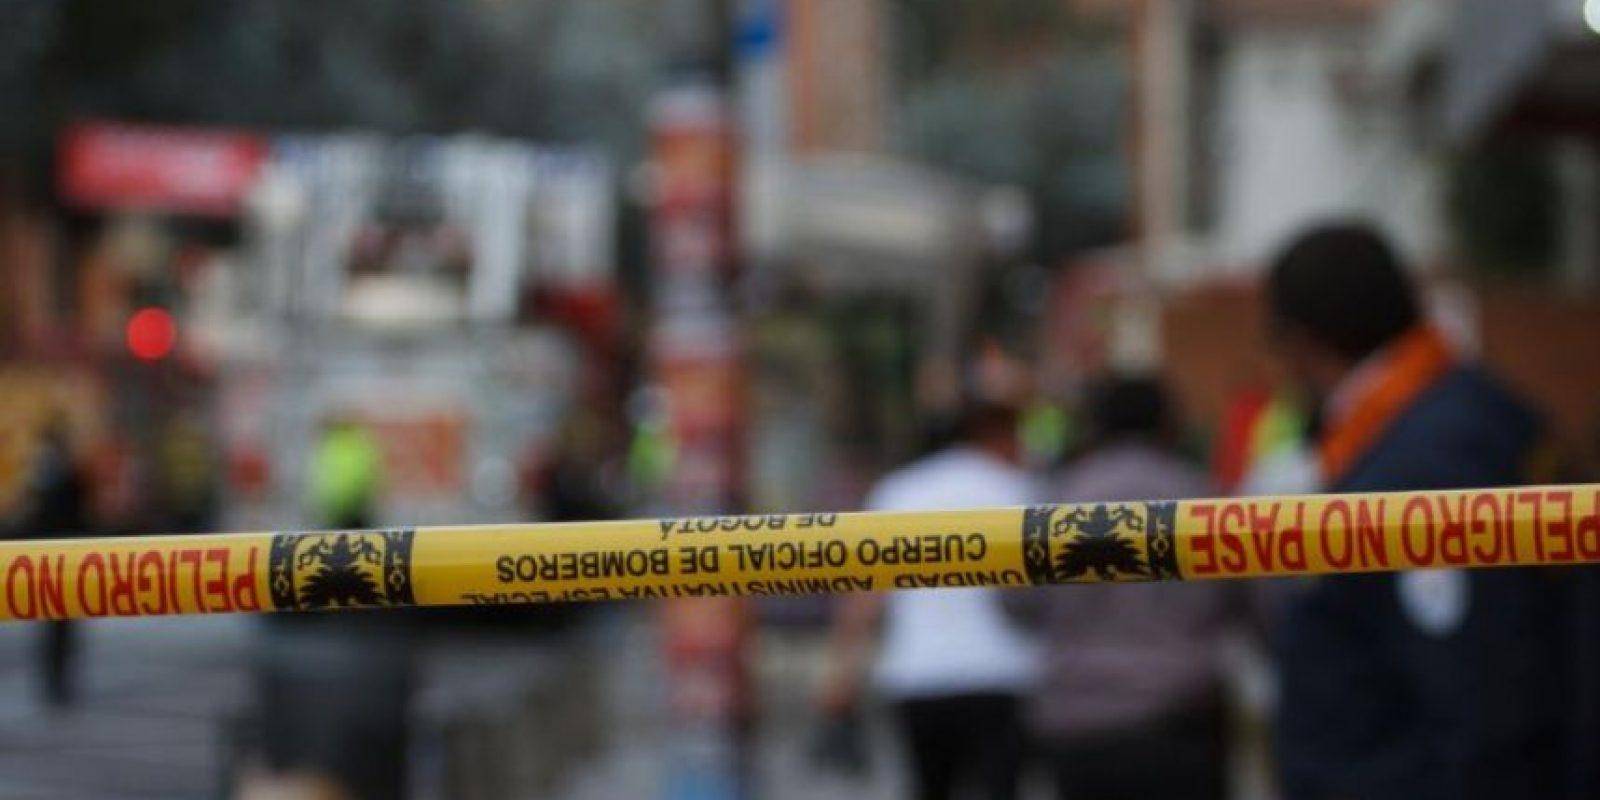 Foto:Juan Pablo Pino/Publimetro Colombia